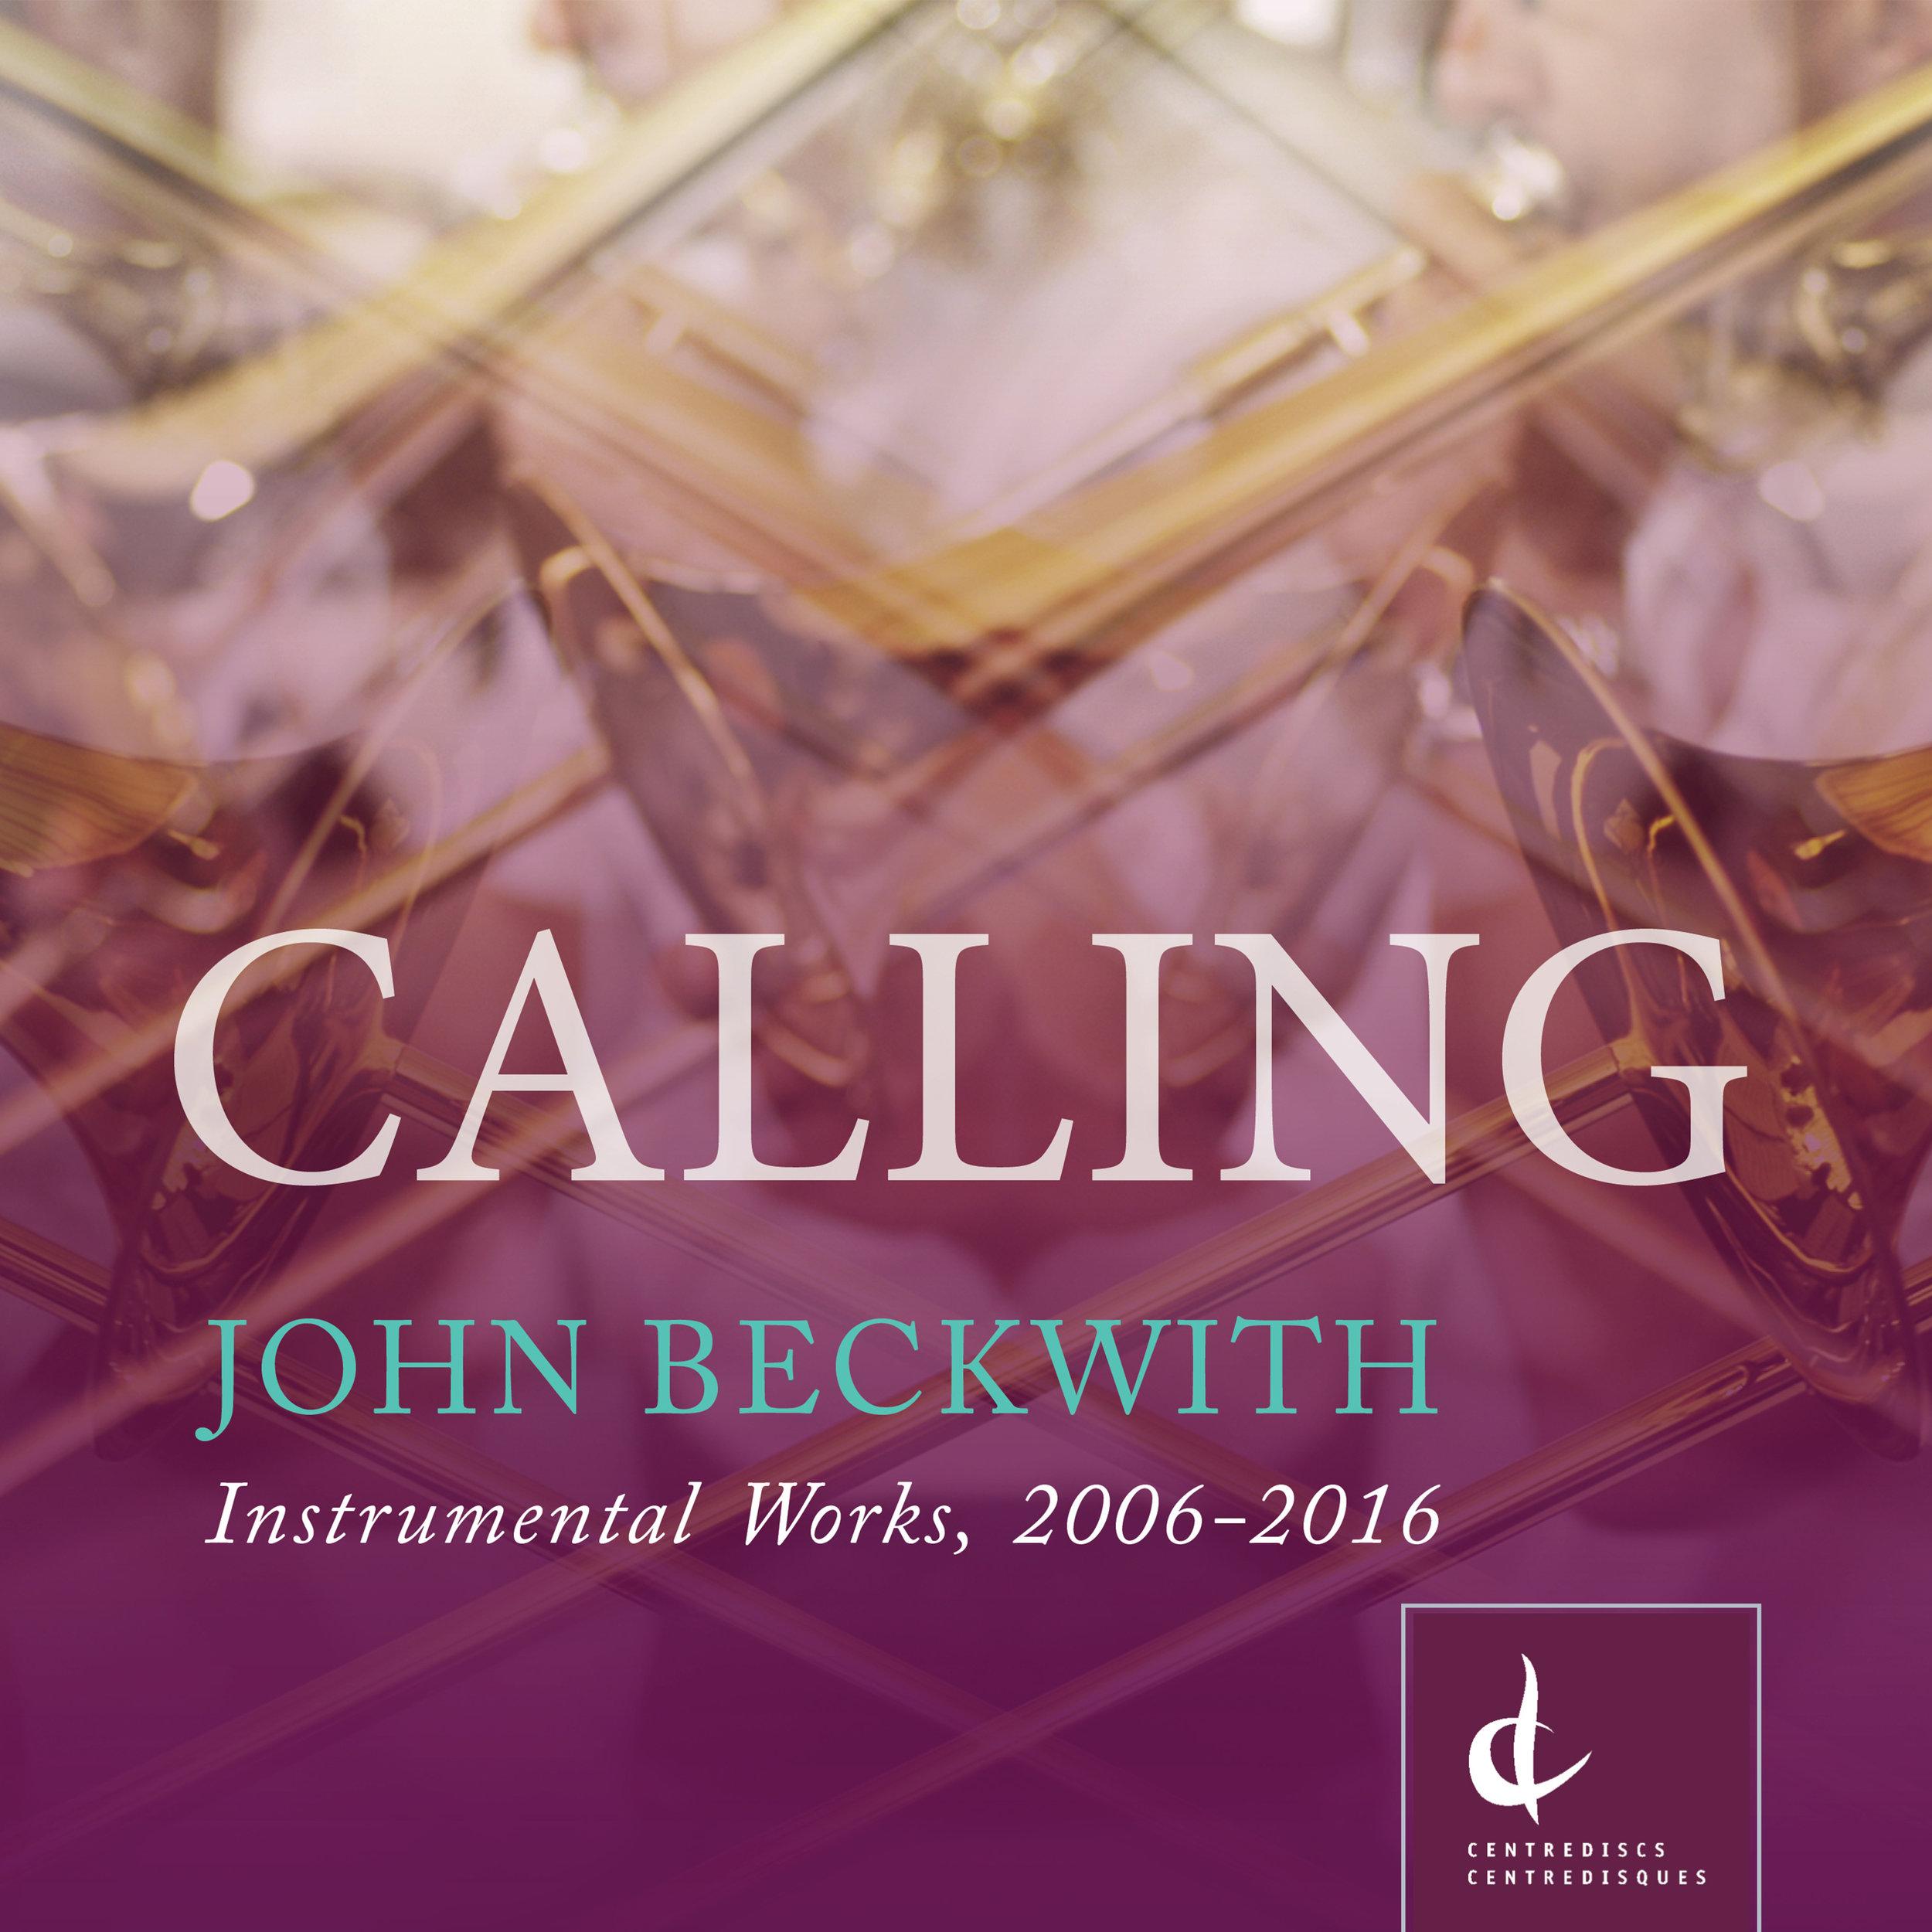 Beckwith-Calling-3000x3000_1.jpg